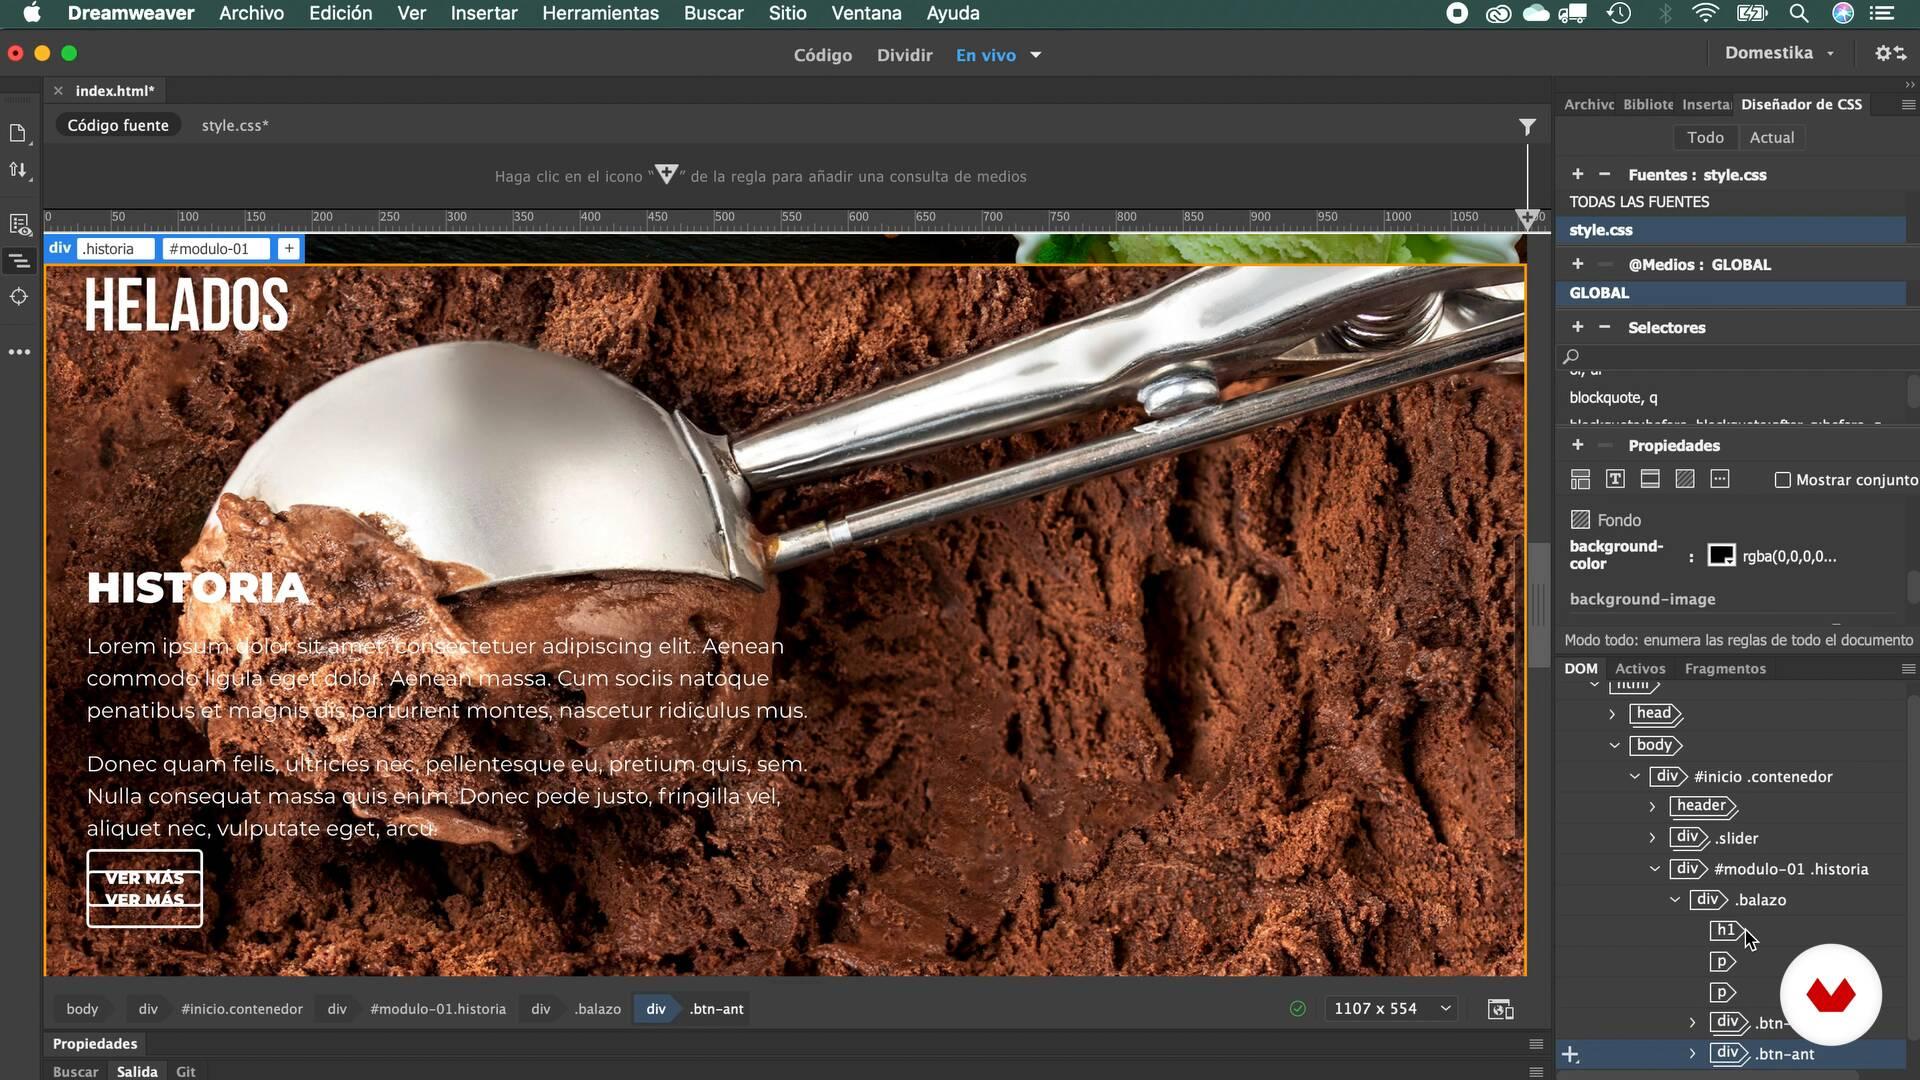 Css Decoration Responsive Web Design With Adobe Dreamweaver Monkylab Domestika